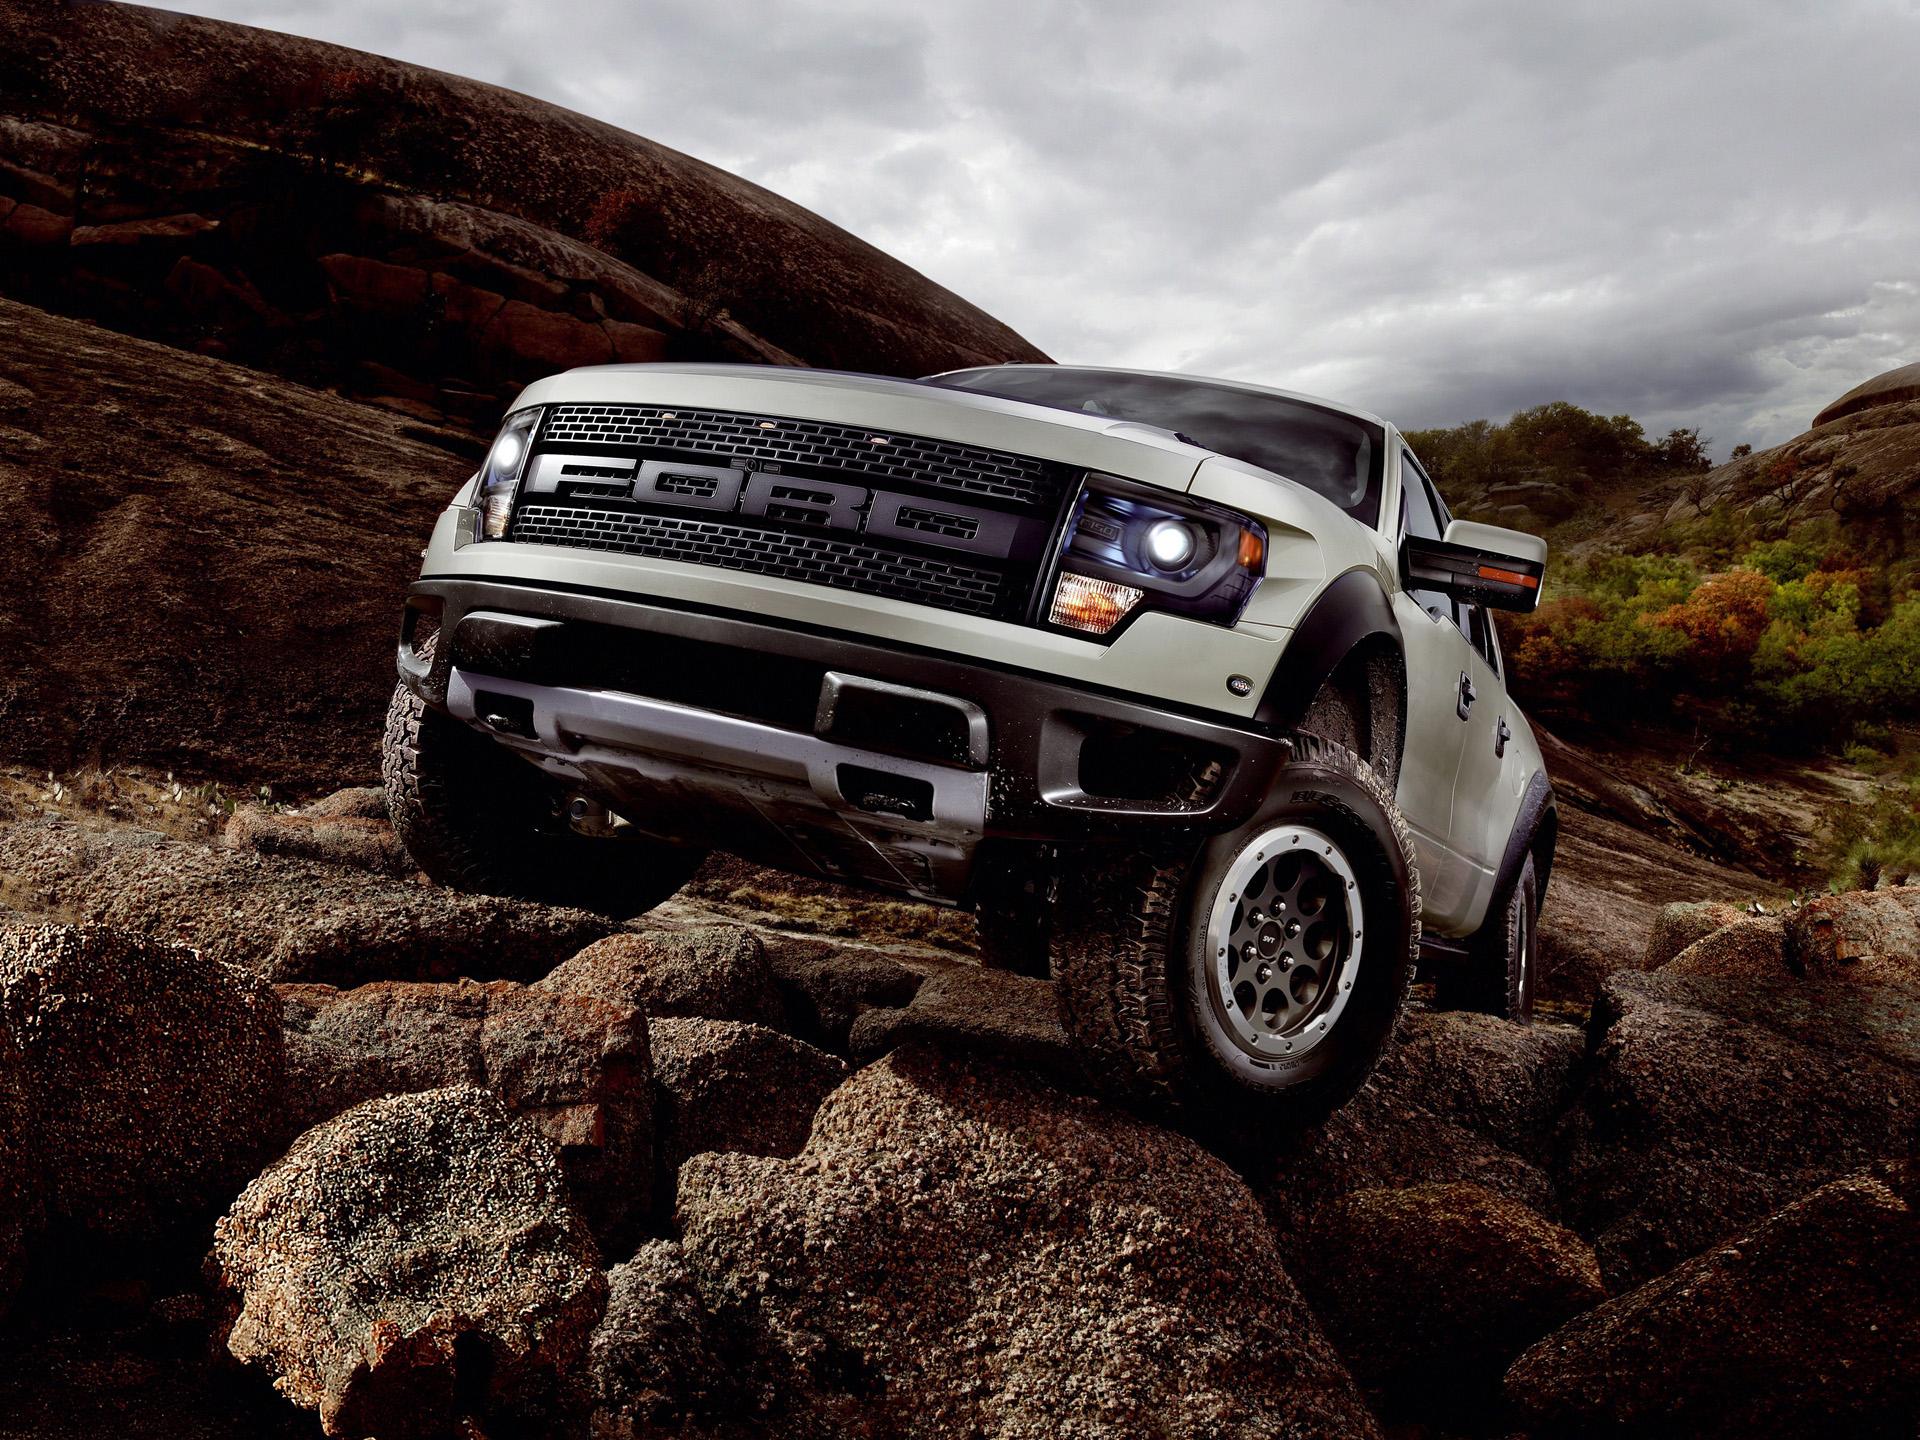 2013 Ford SVT Raptor Static wallpapers 2013 Ford SVT Raptor Static 1920x1440